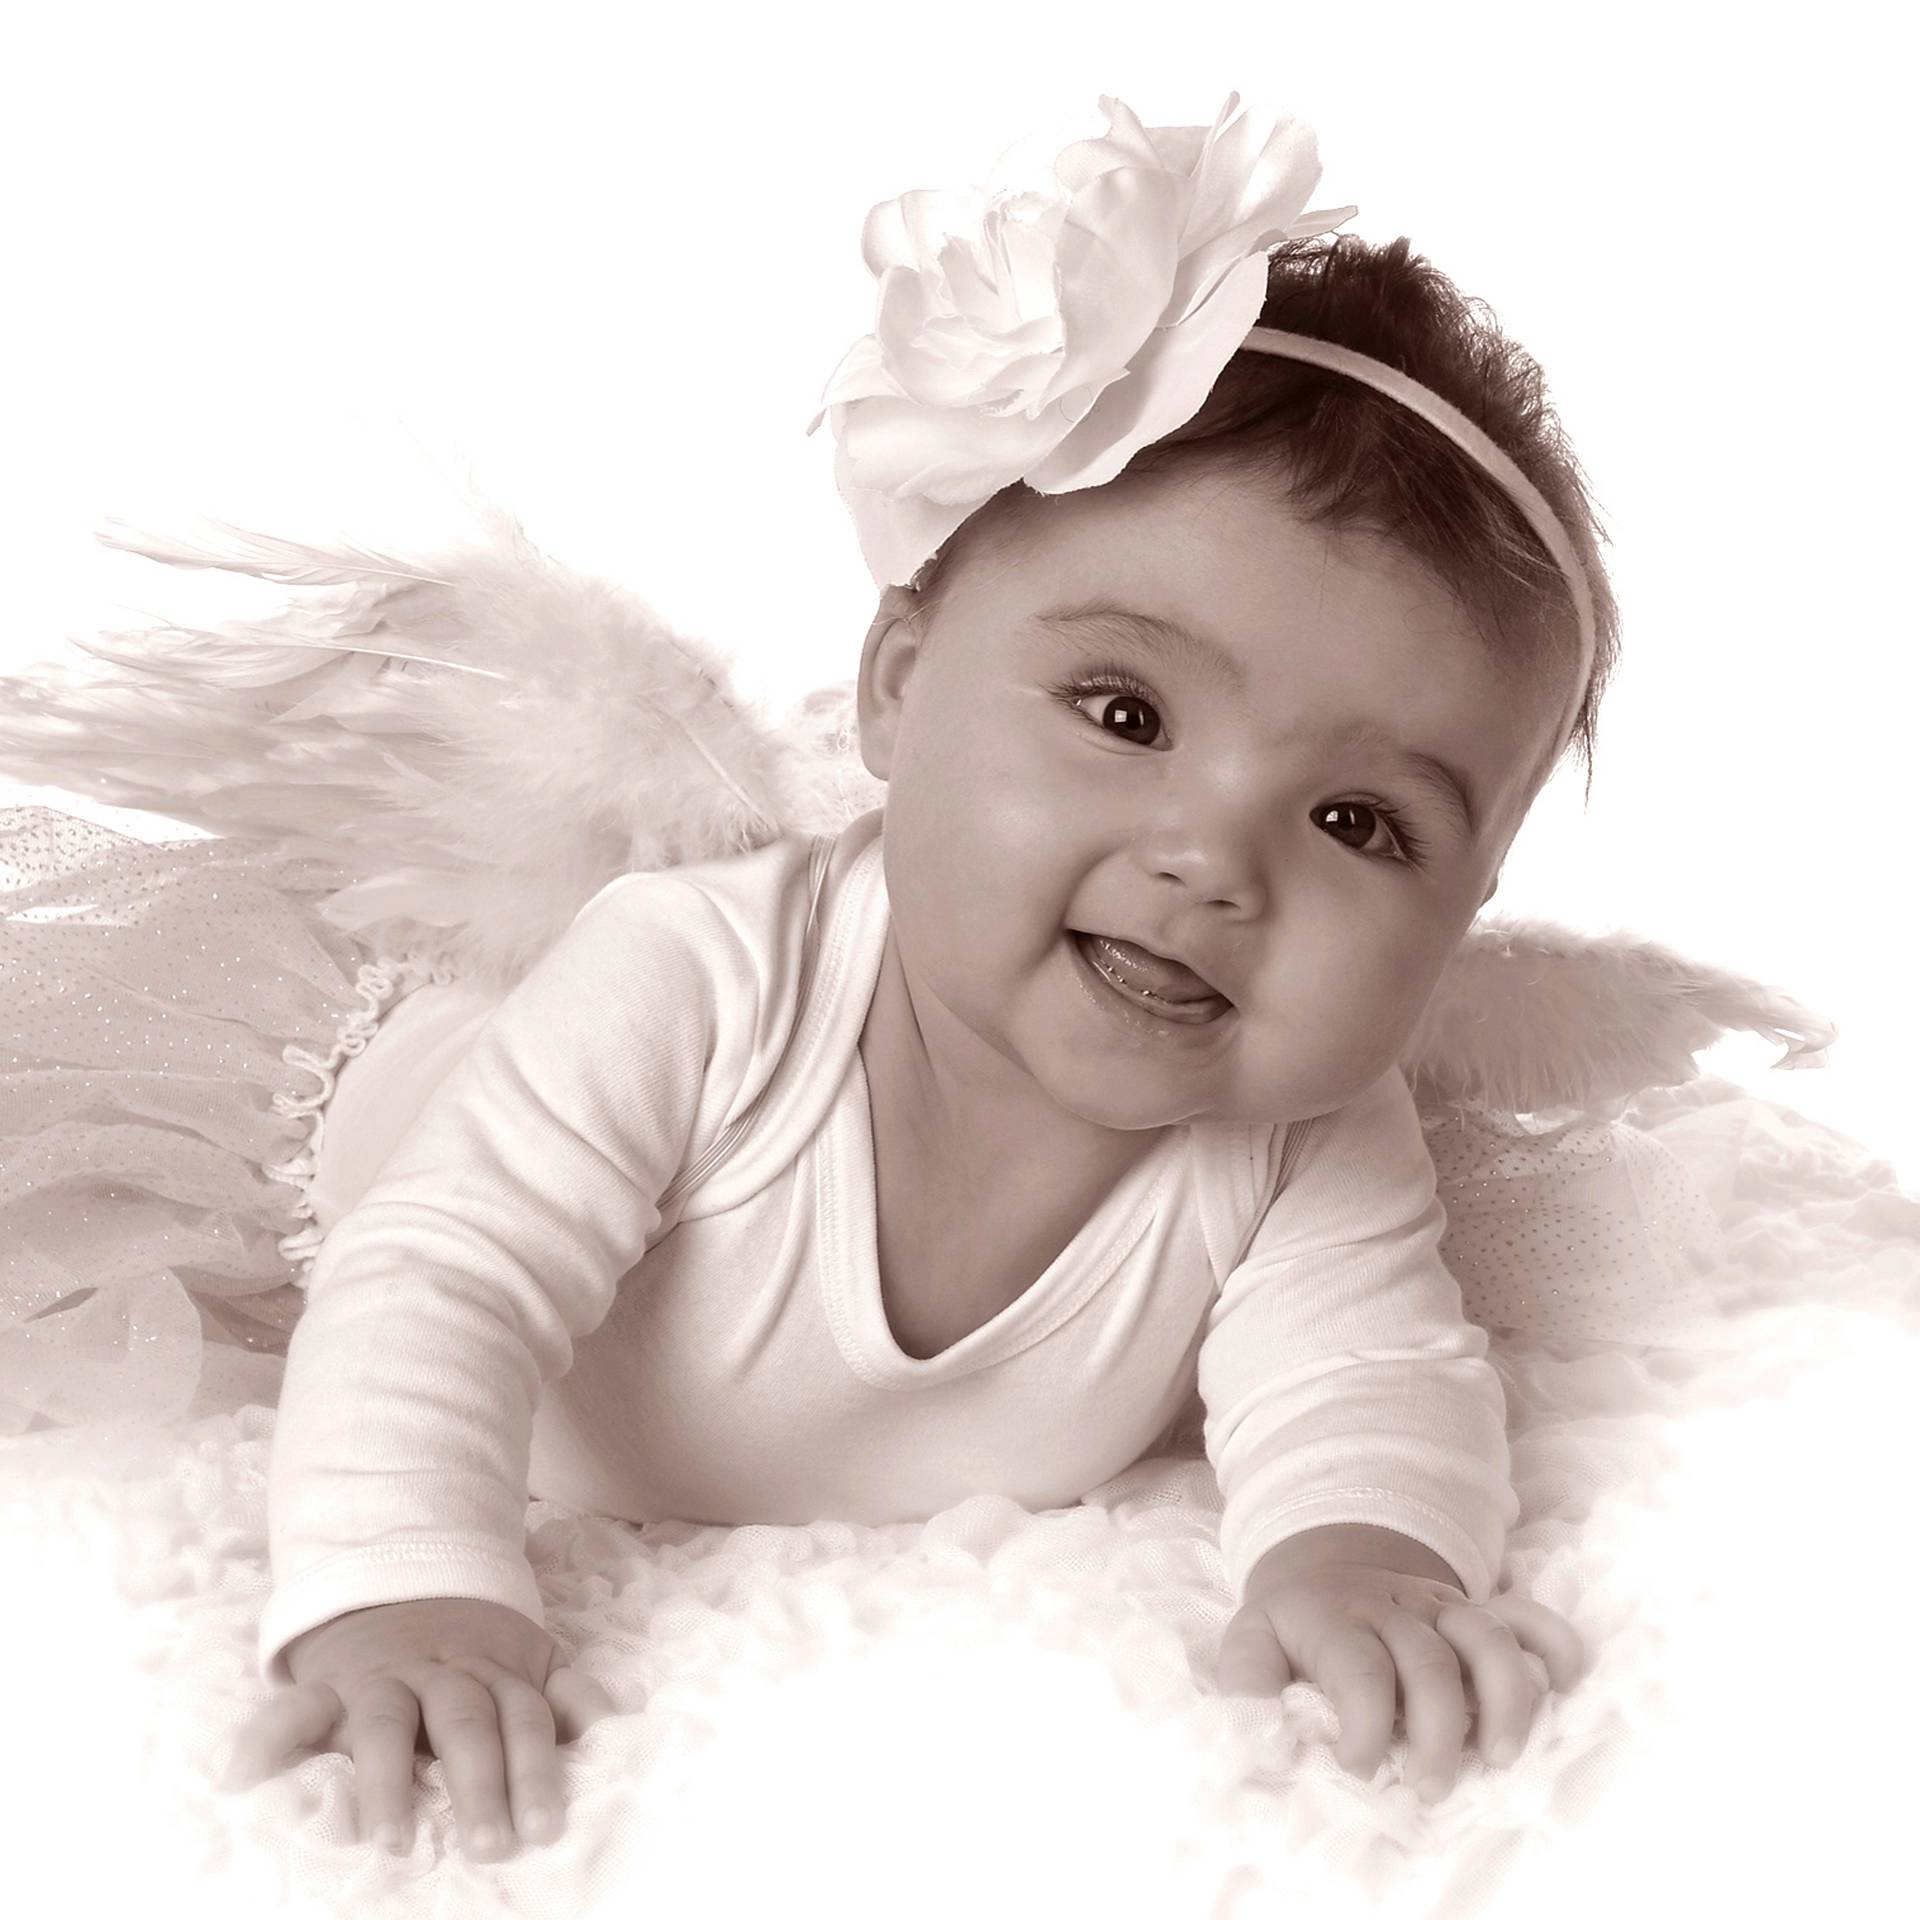 Kinderfotos Beispiel1 Foto Sawatzki